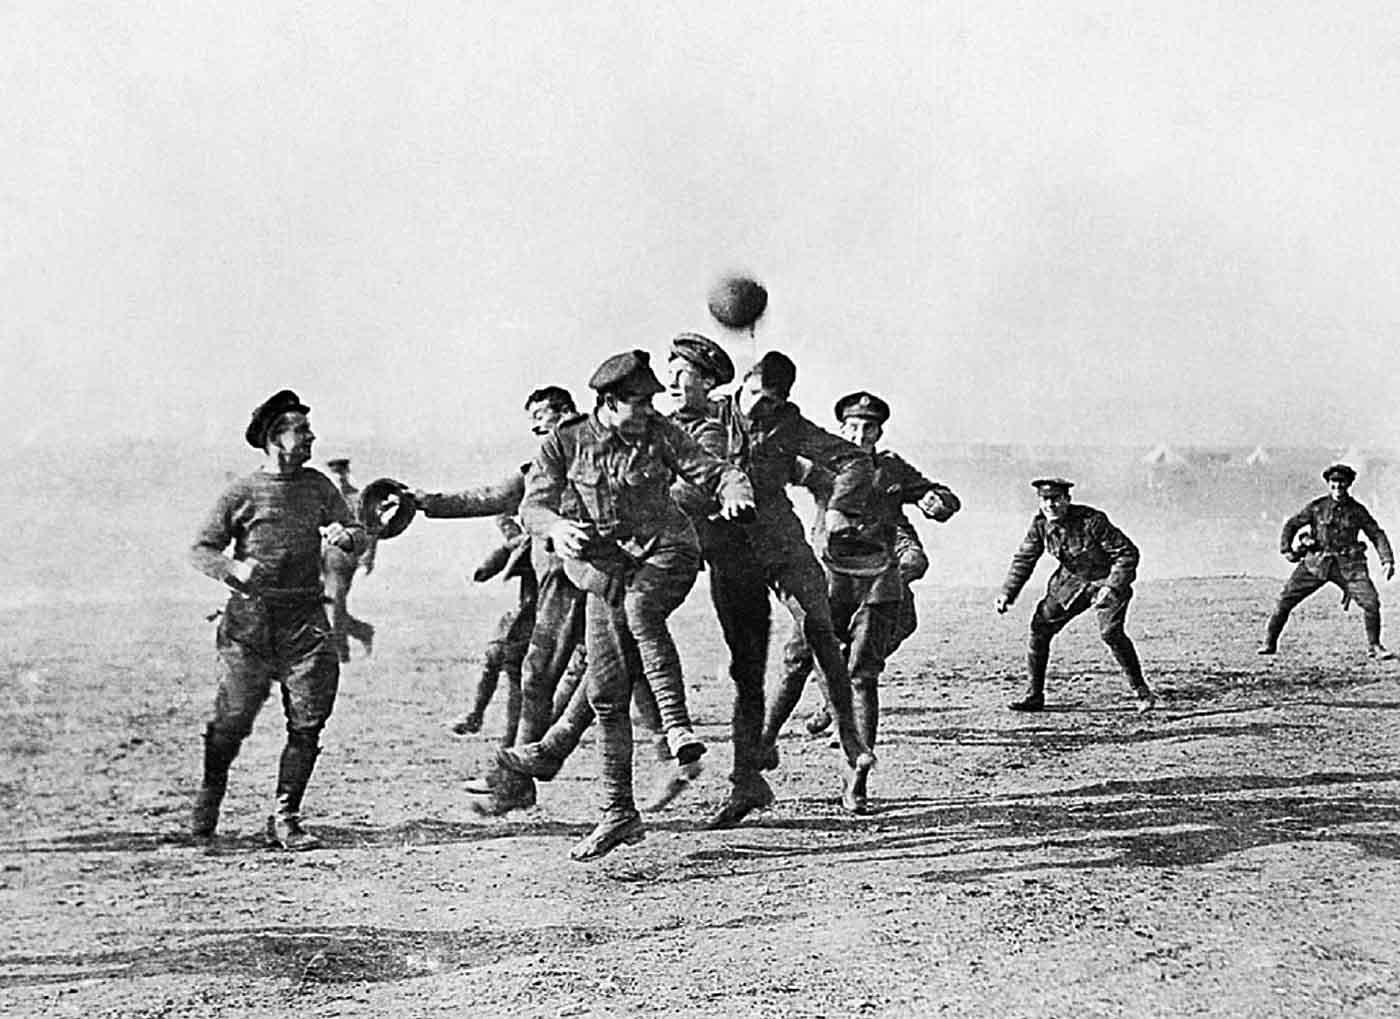 History in Photos: World War I, ctd